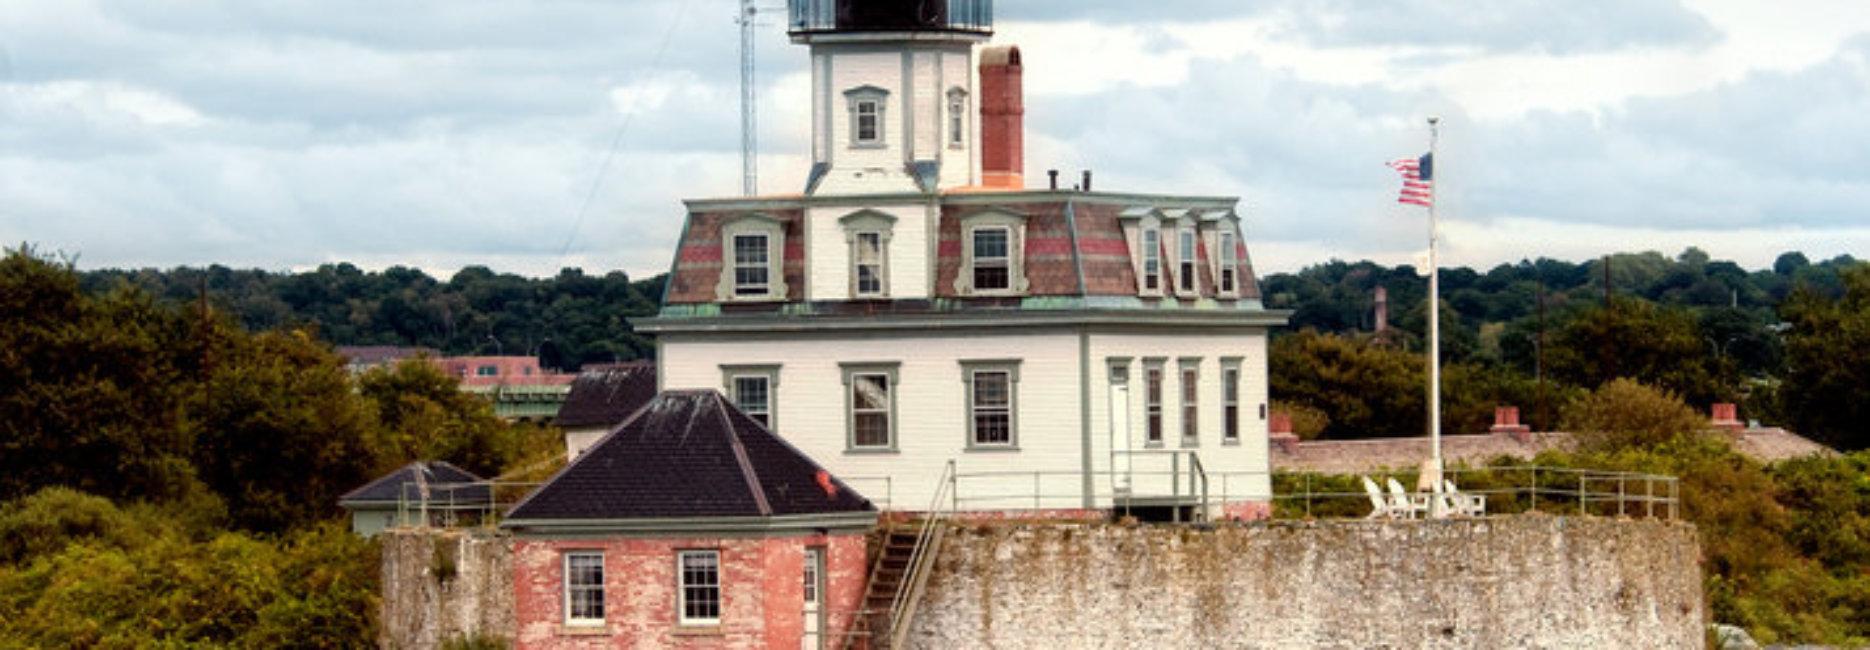 Newport Ri Harbor Sights Spotlight On Rose Island Sightsailing